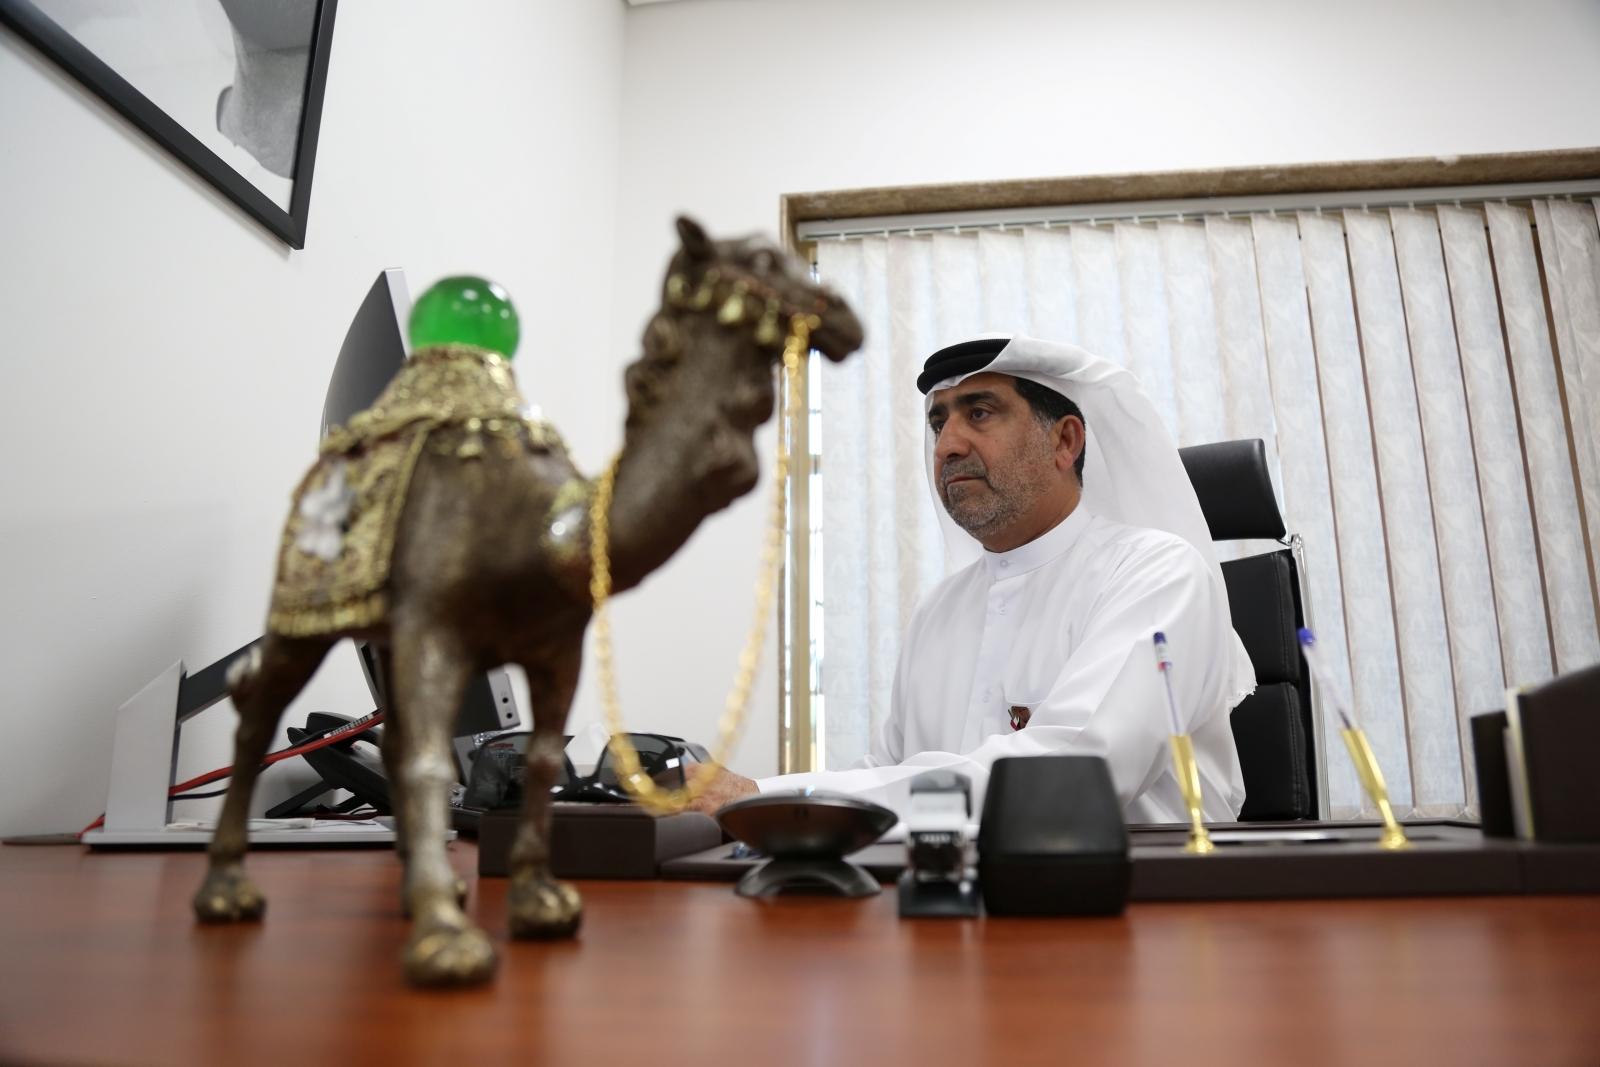 Dubai Camel Hospital boss